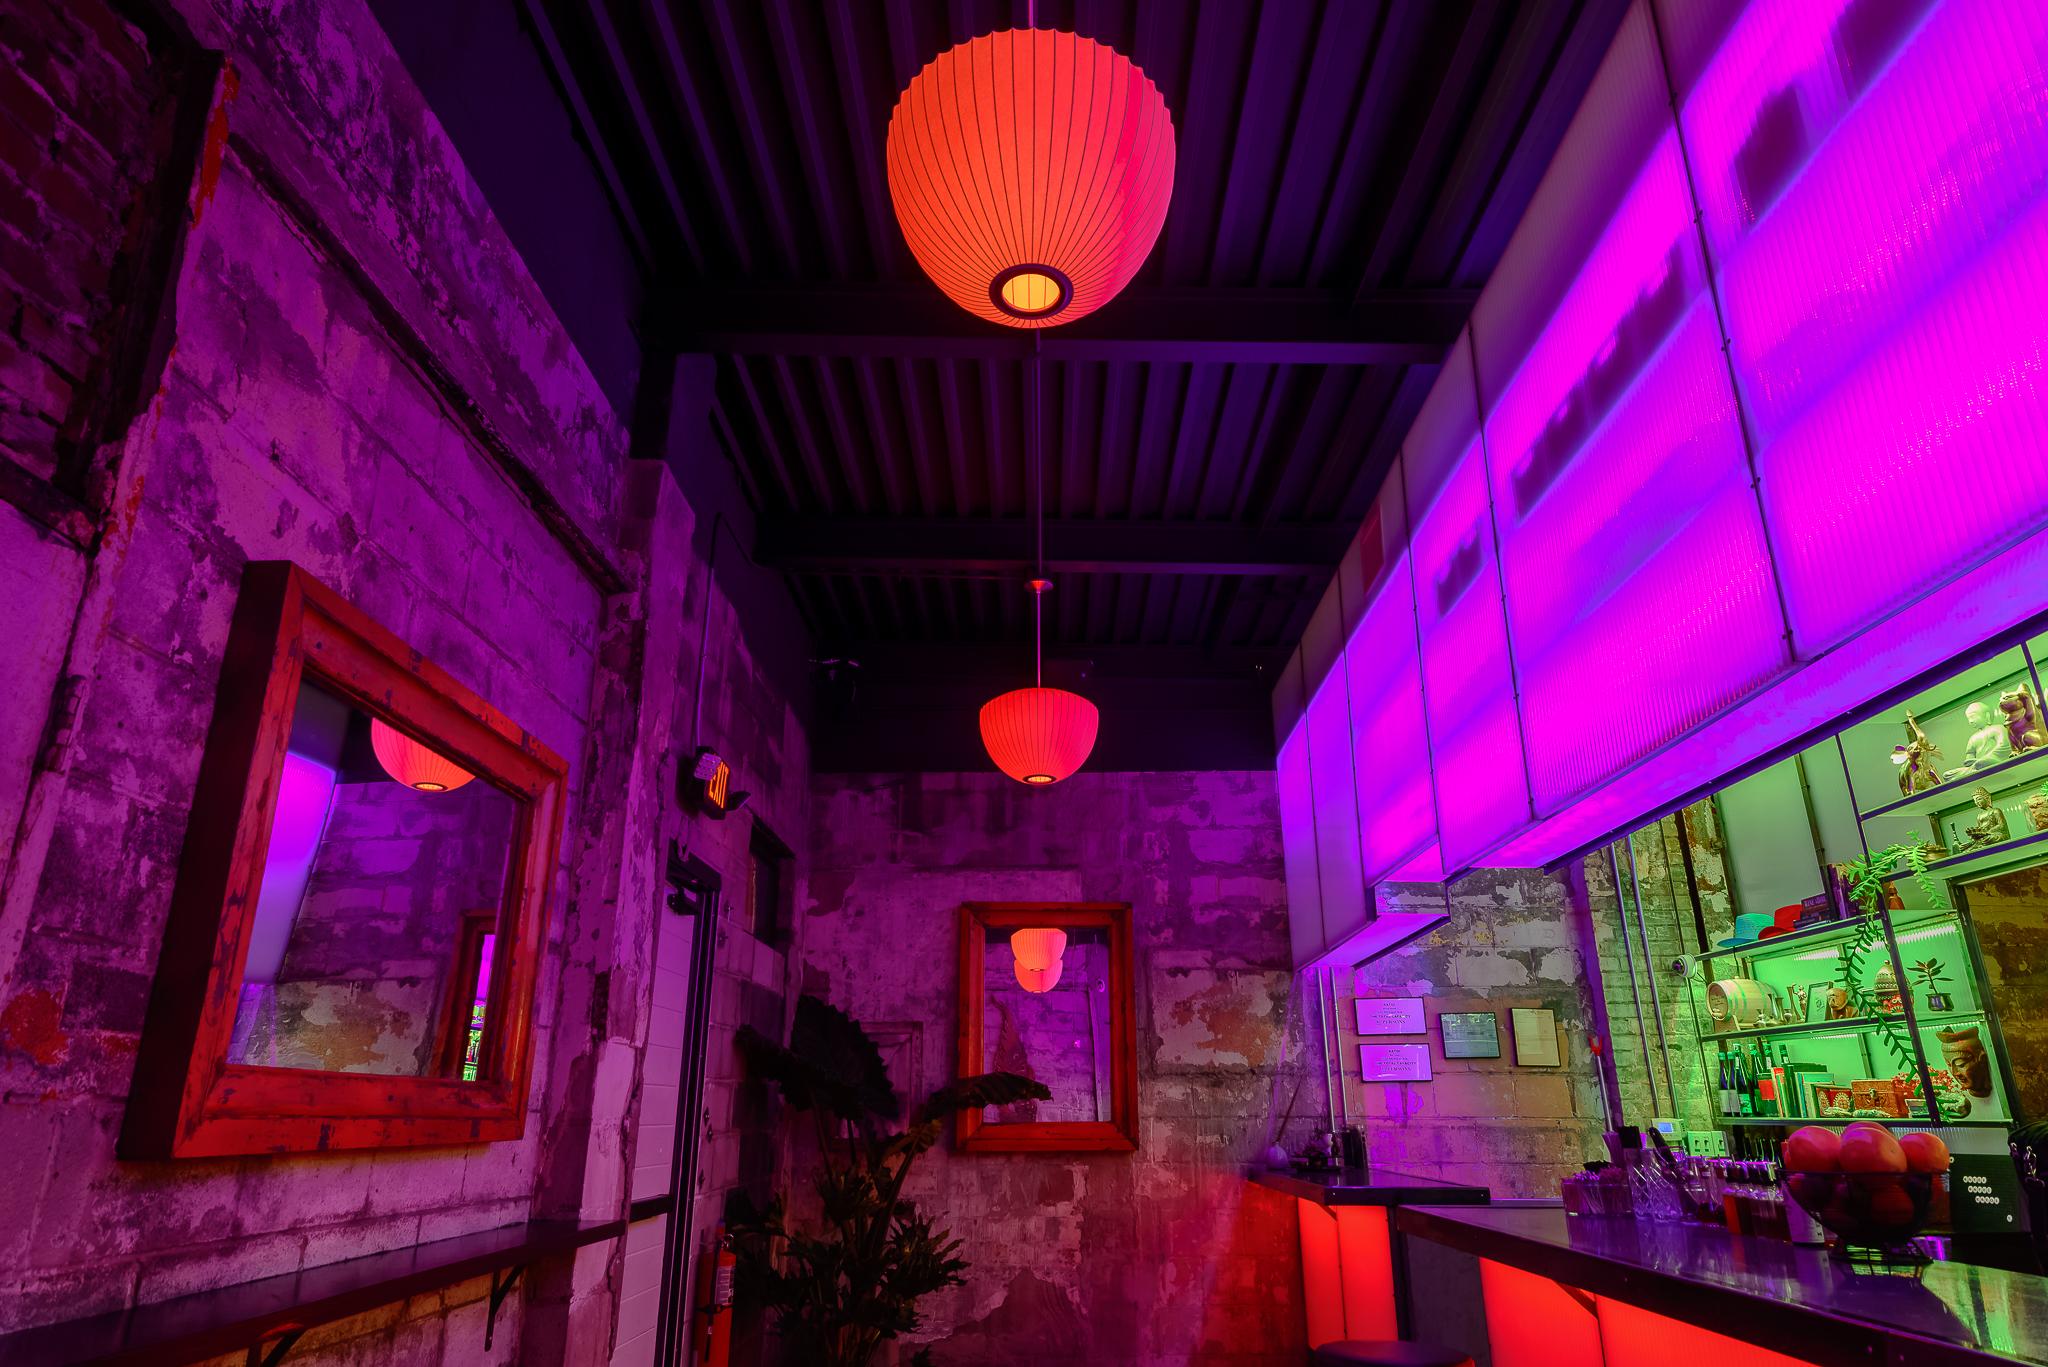 katoi_bar_interior_night.jpg